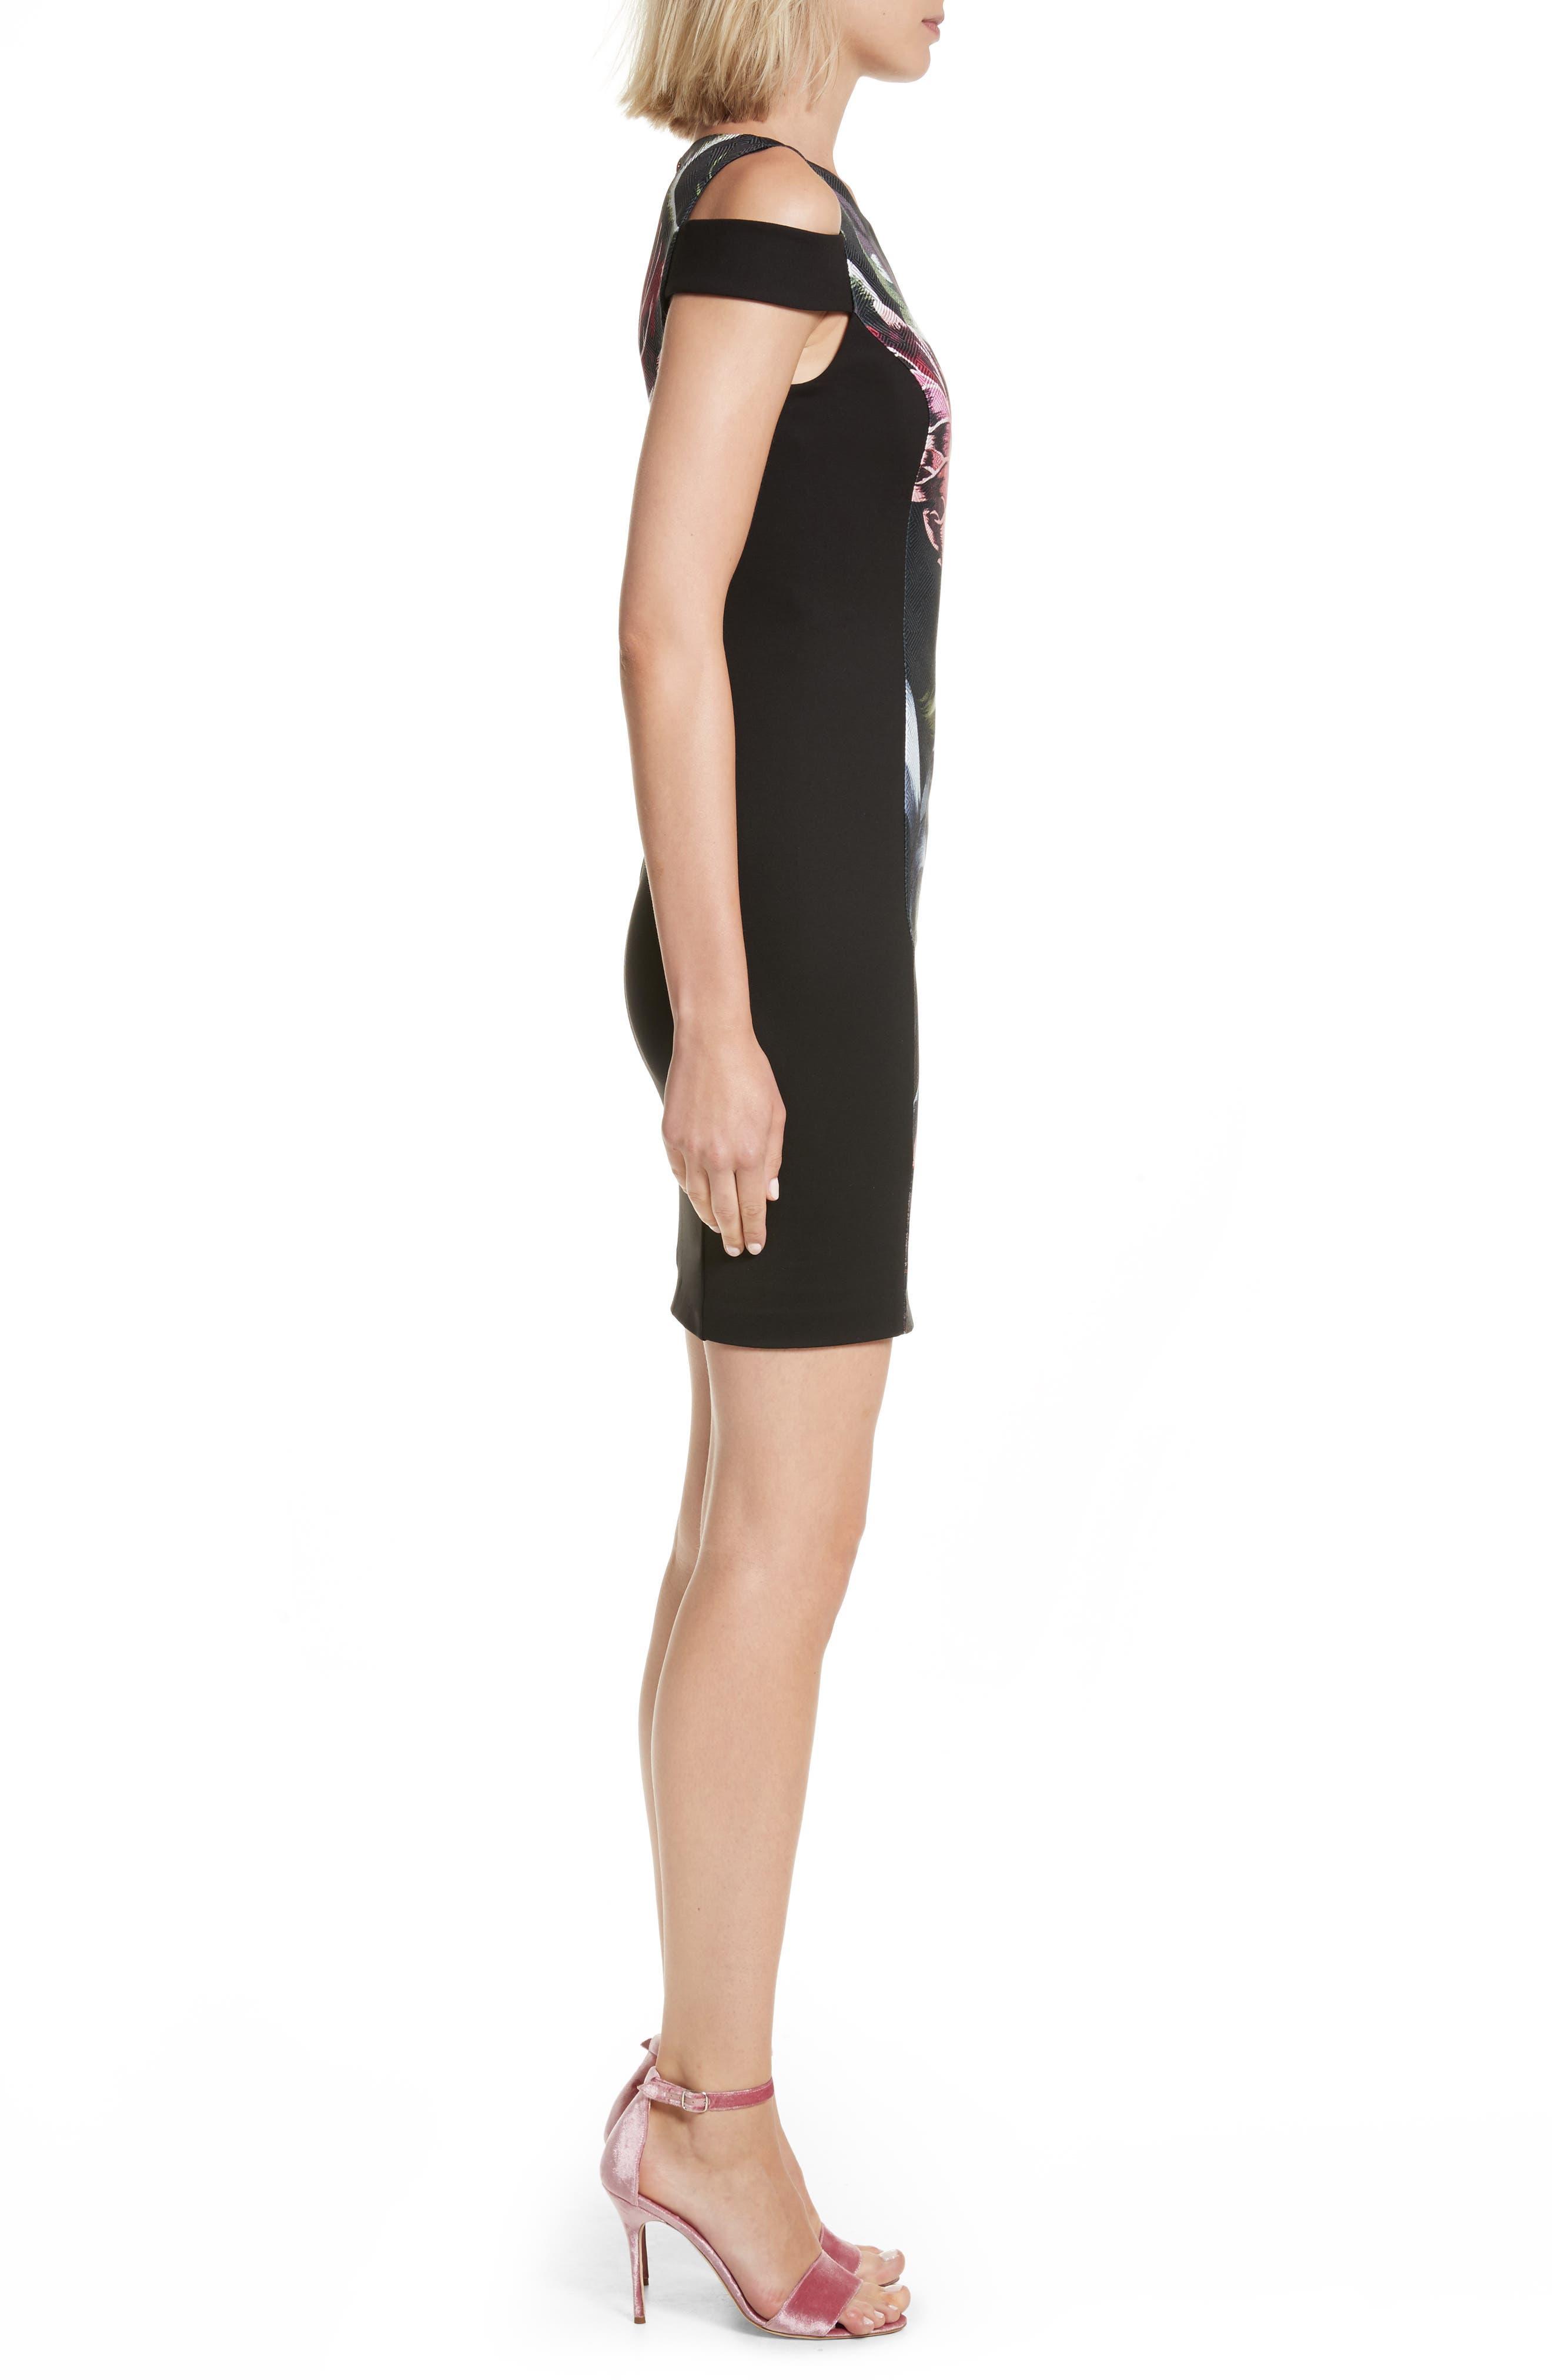 Leeash Eden Body Con Dress,                             Alternate thumbnail 3, color,                             Black